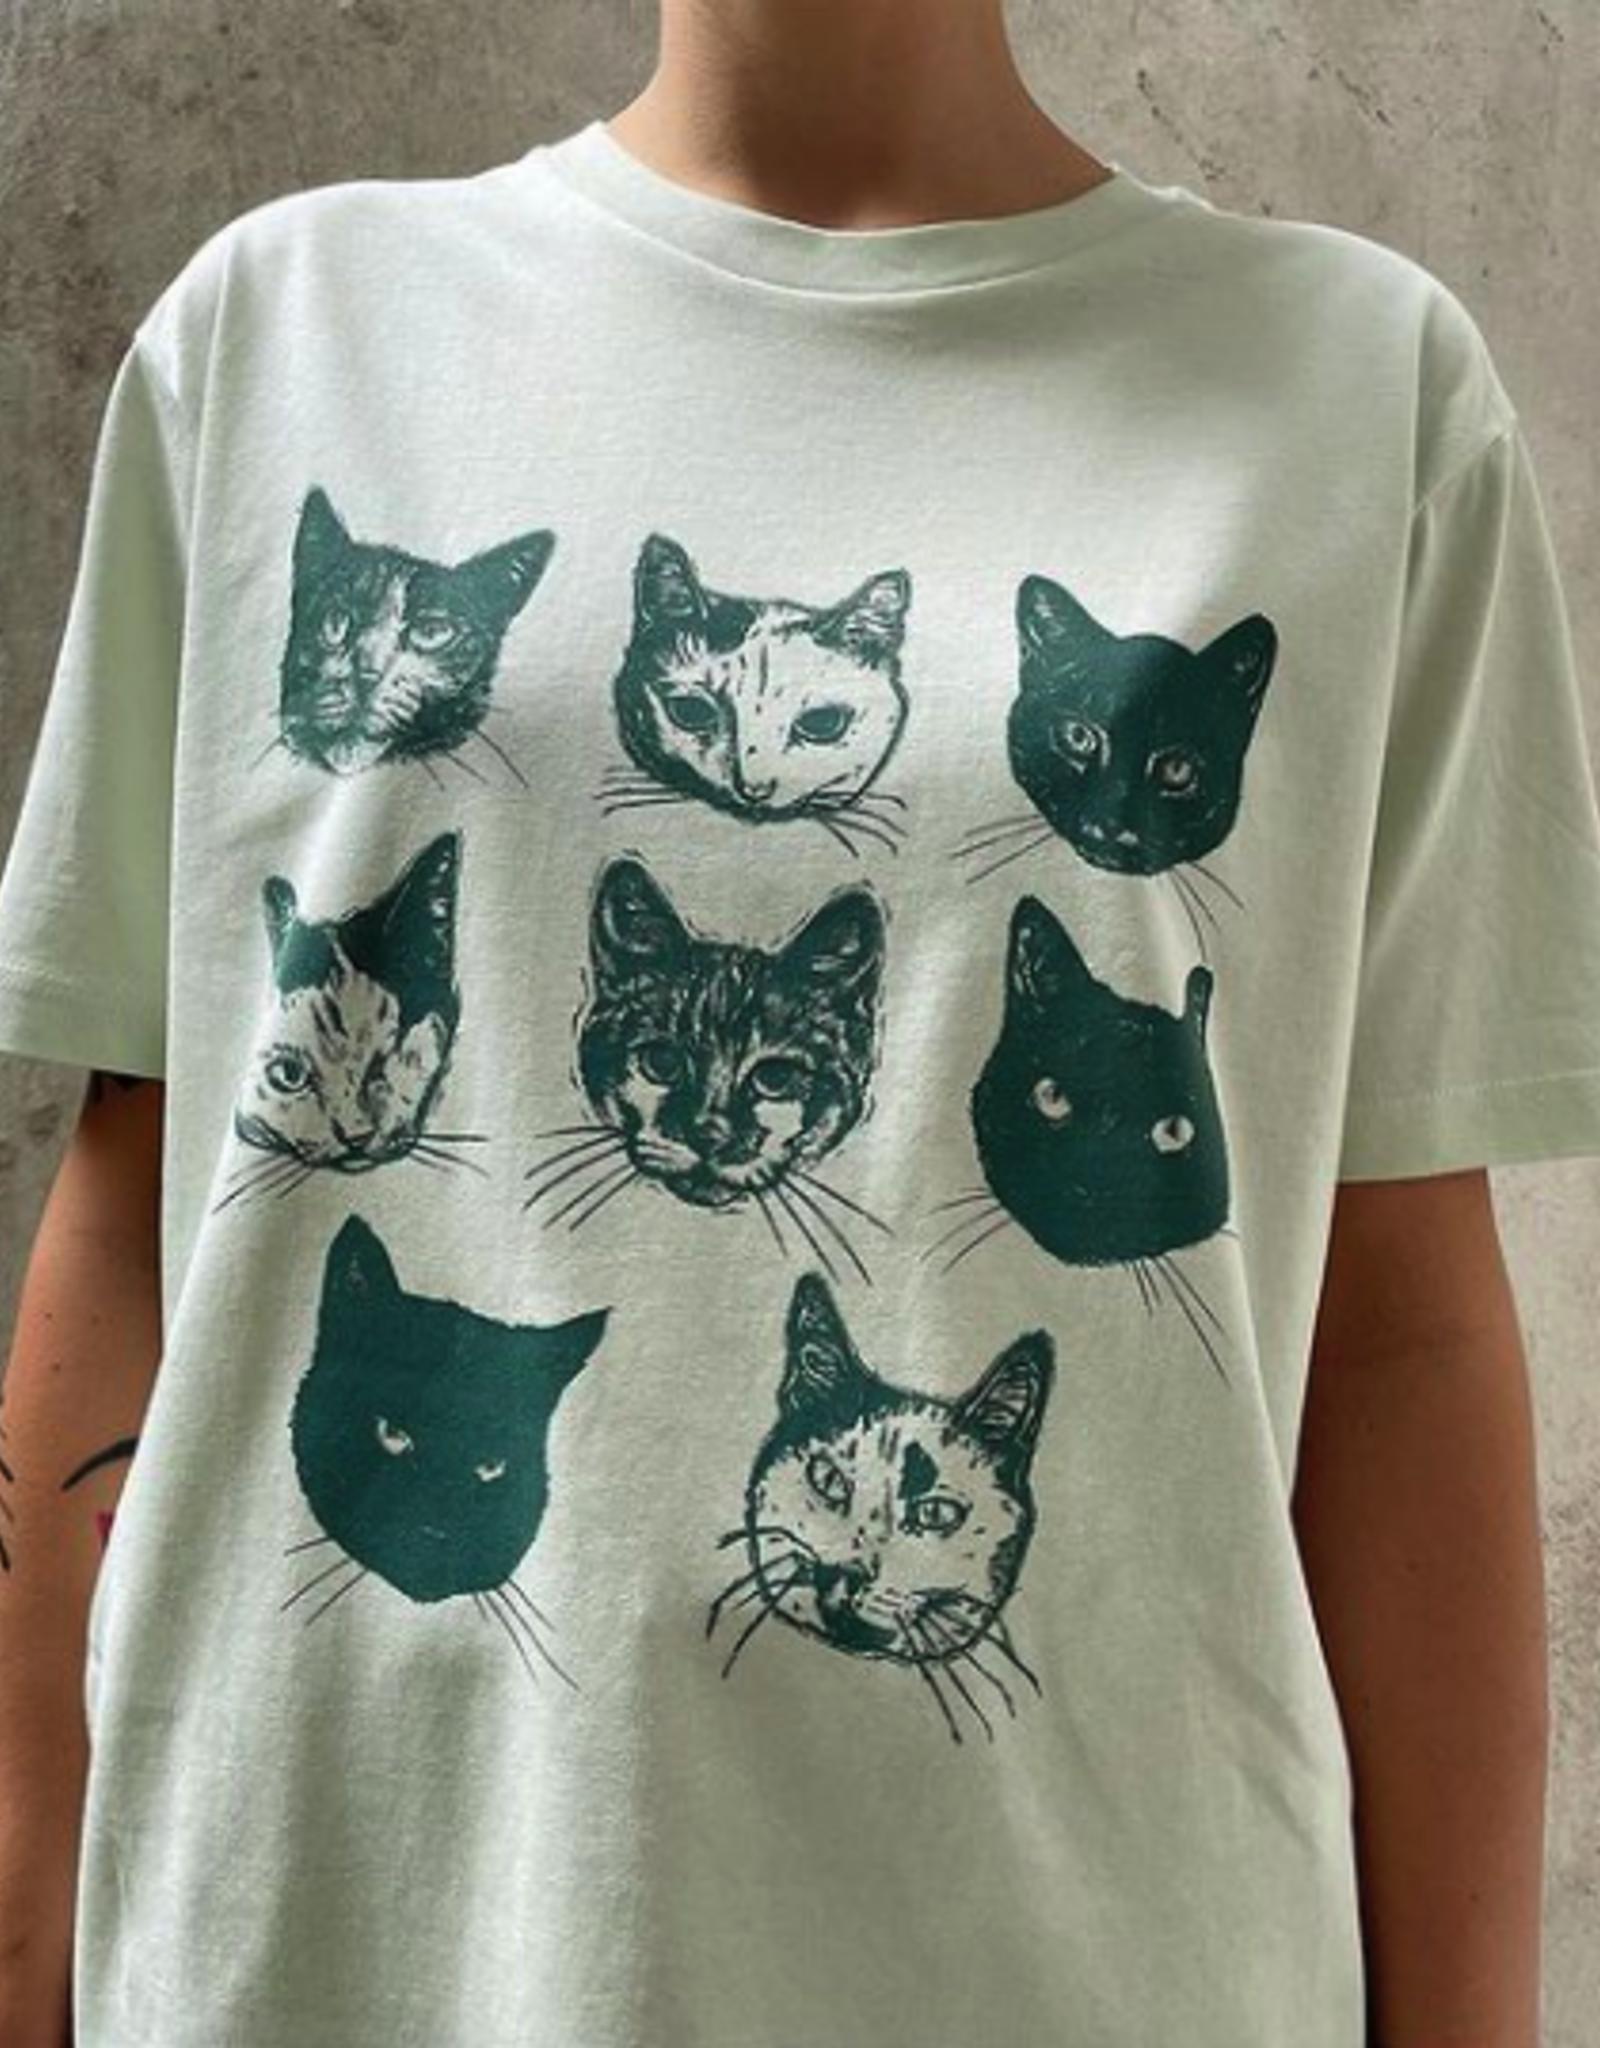 Kopjes Kopjes portretjes - T-shirt - Boxy- Green- XXS